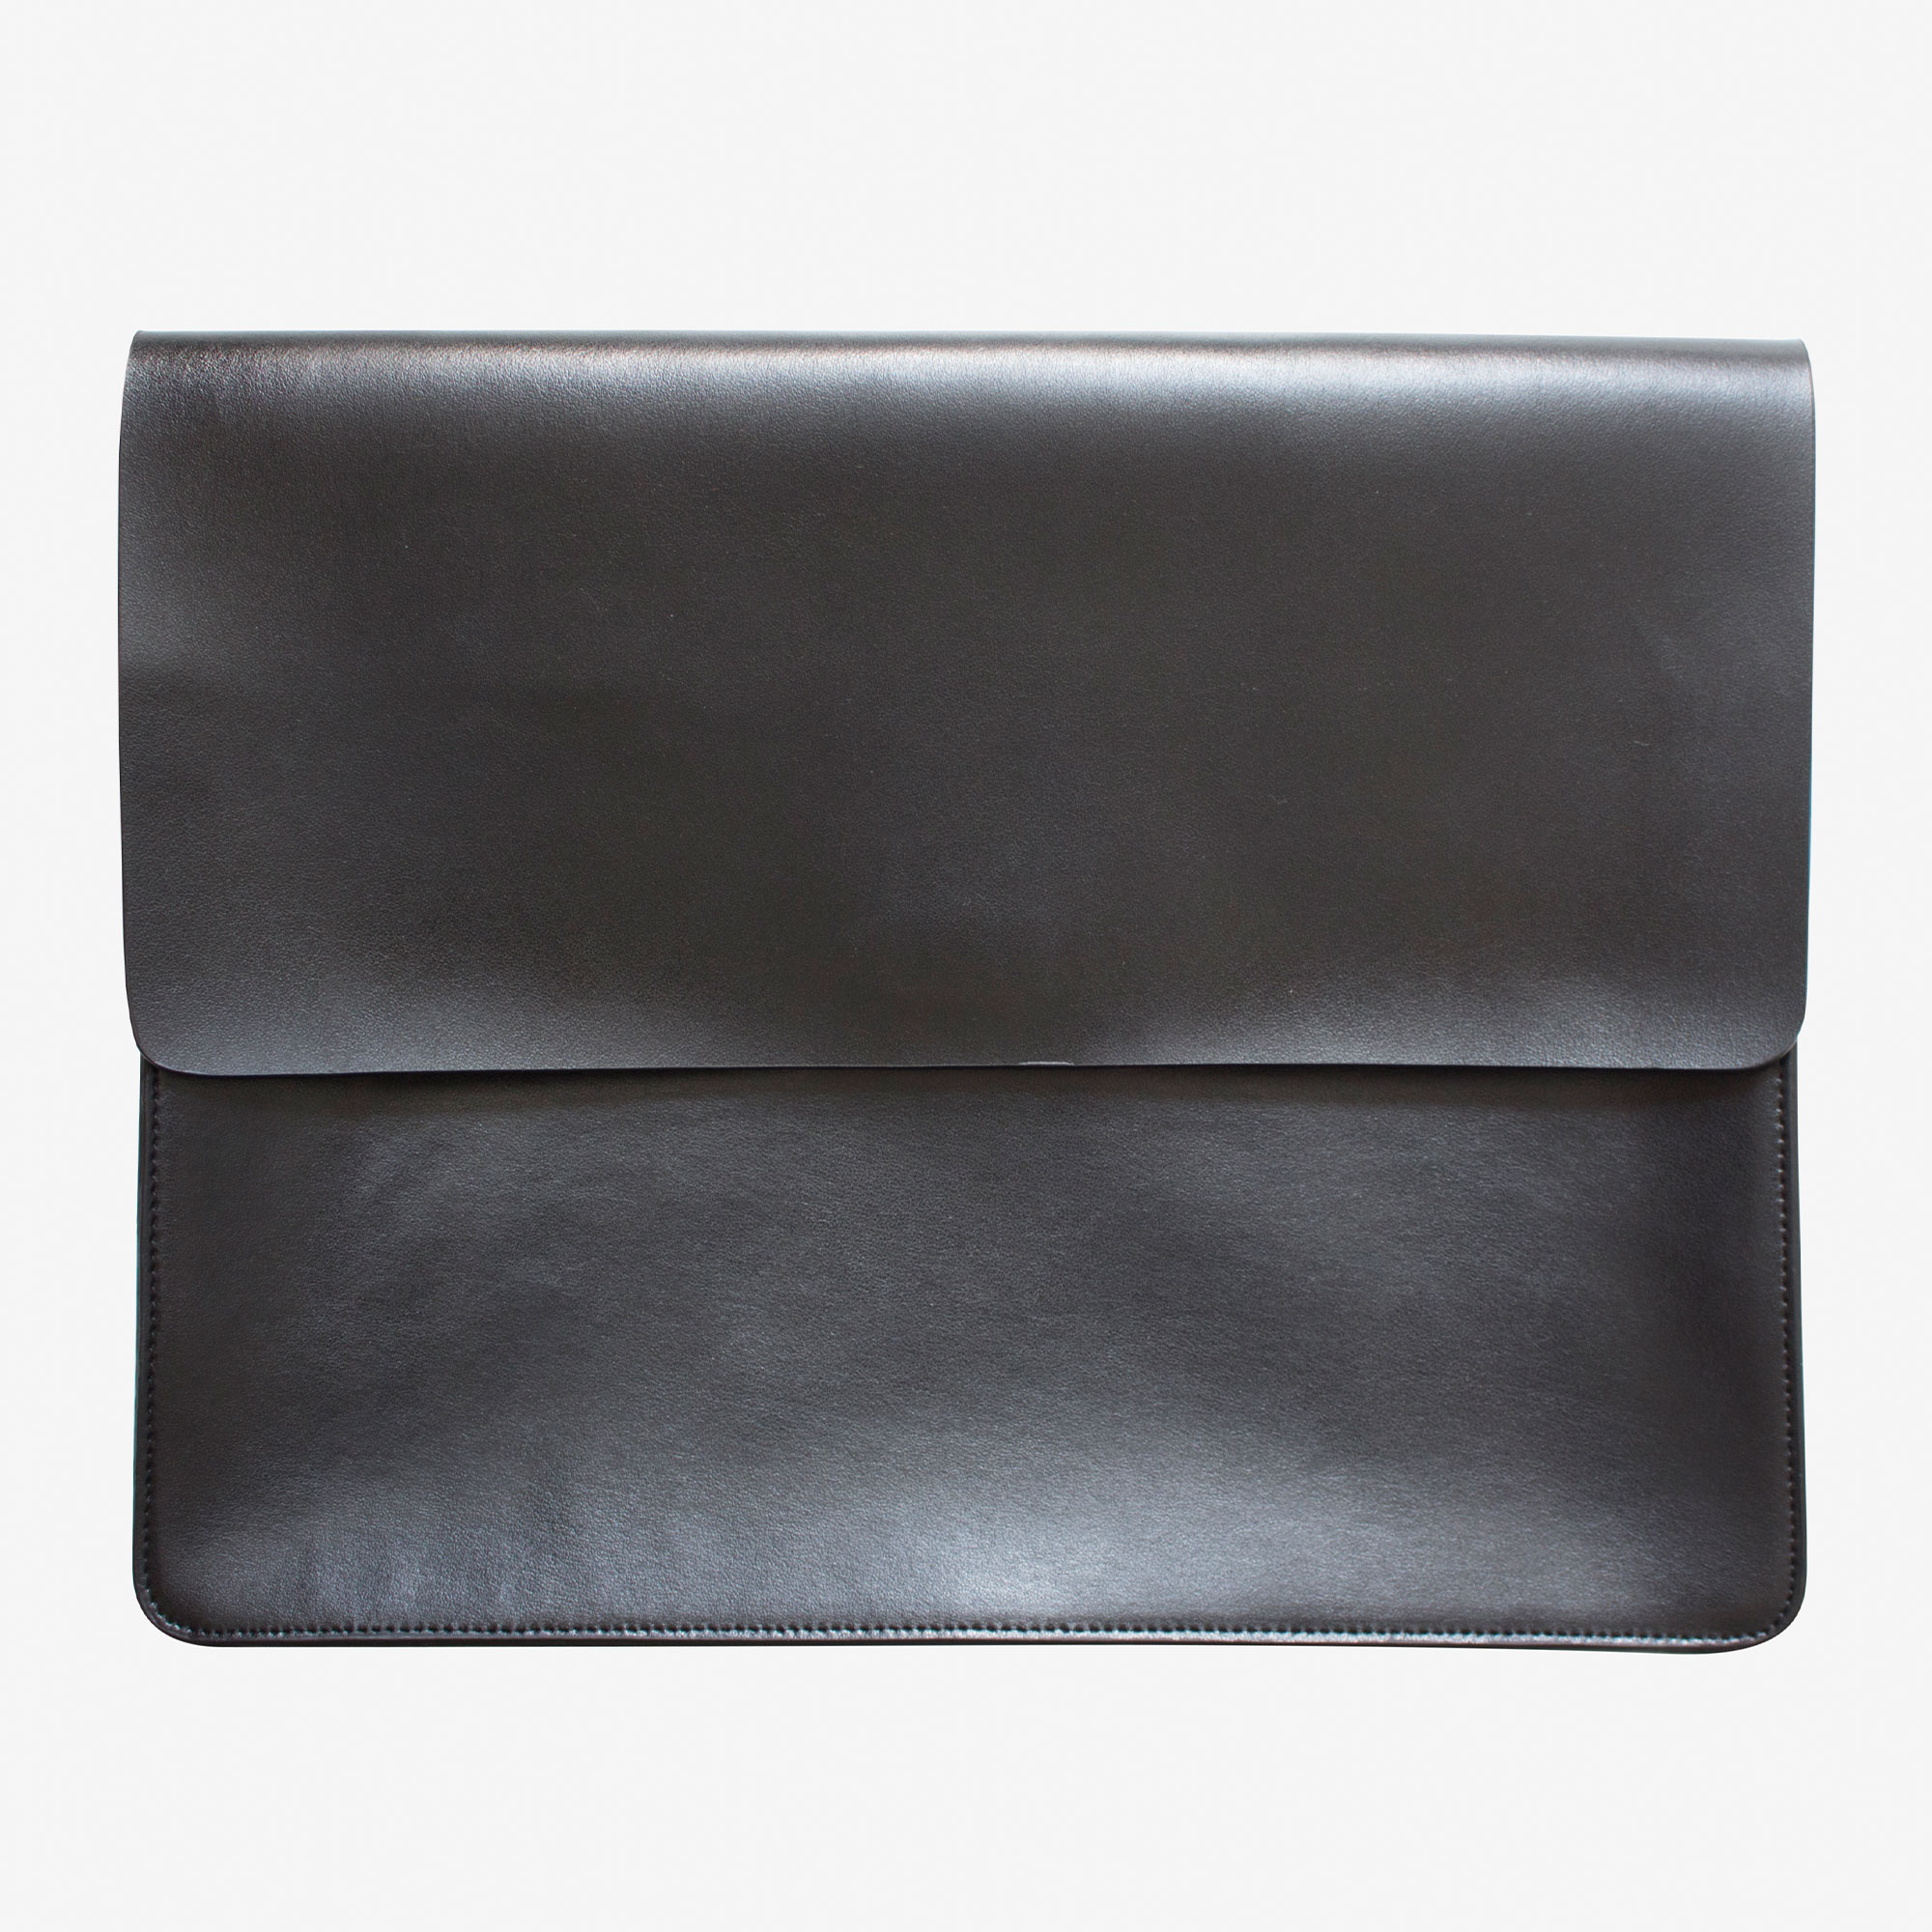 91970-leather-satchel-black-1